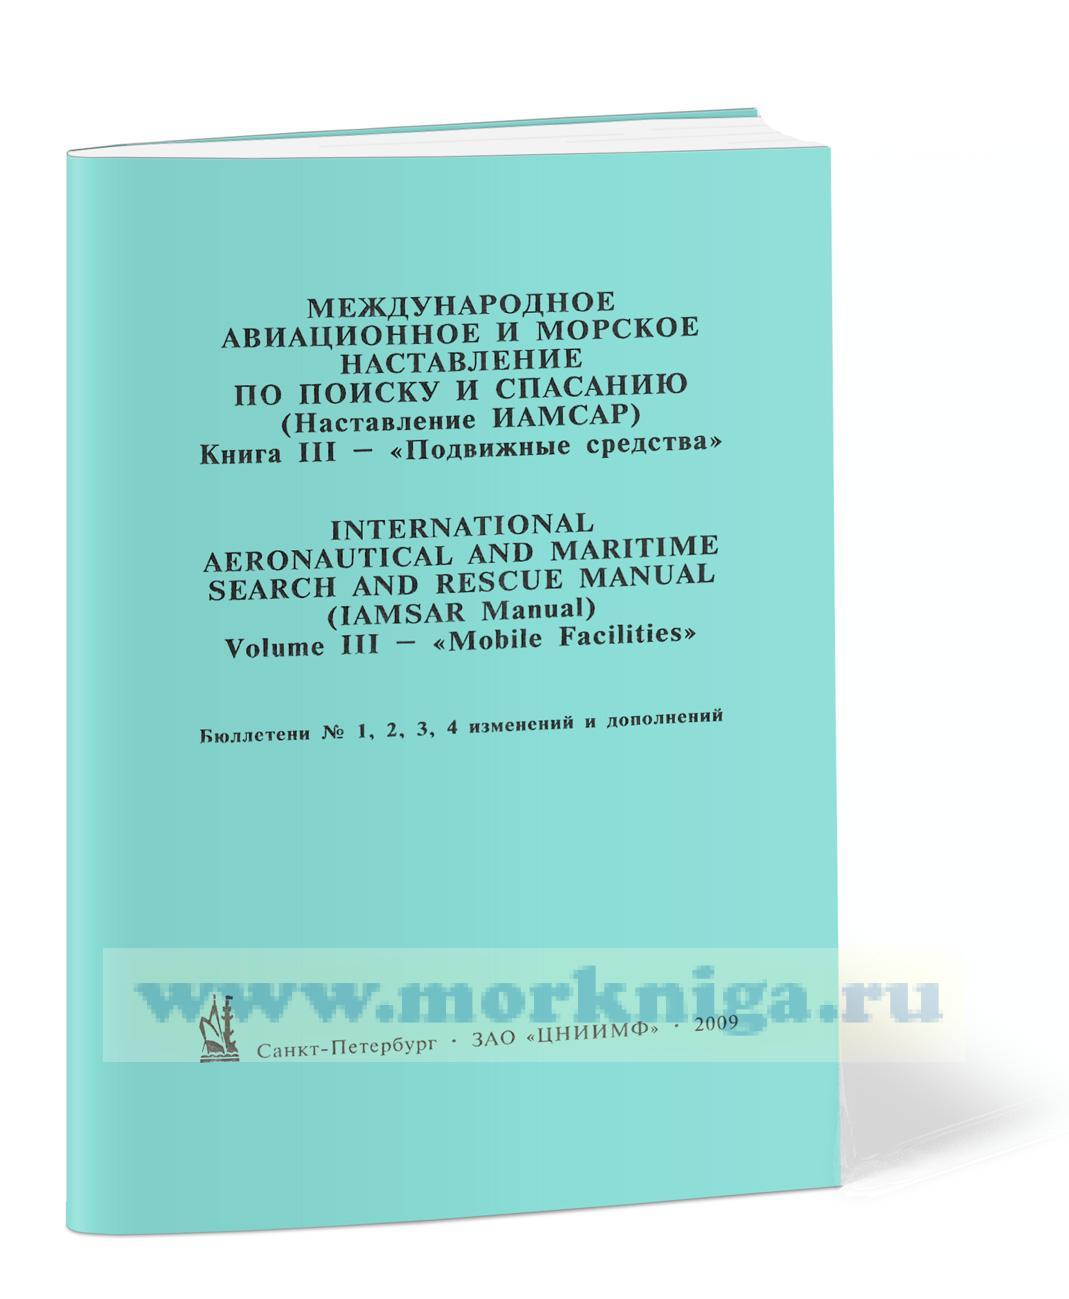 Бюллетени № 1, 2, 3, 4 к Наставлению ИАМСАР, кн. III -